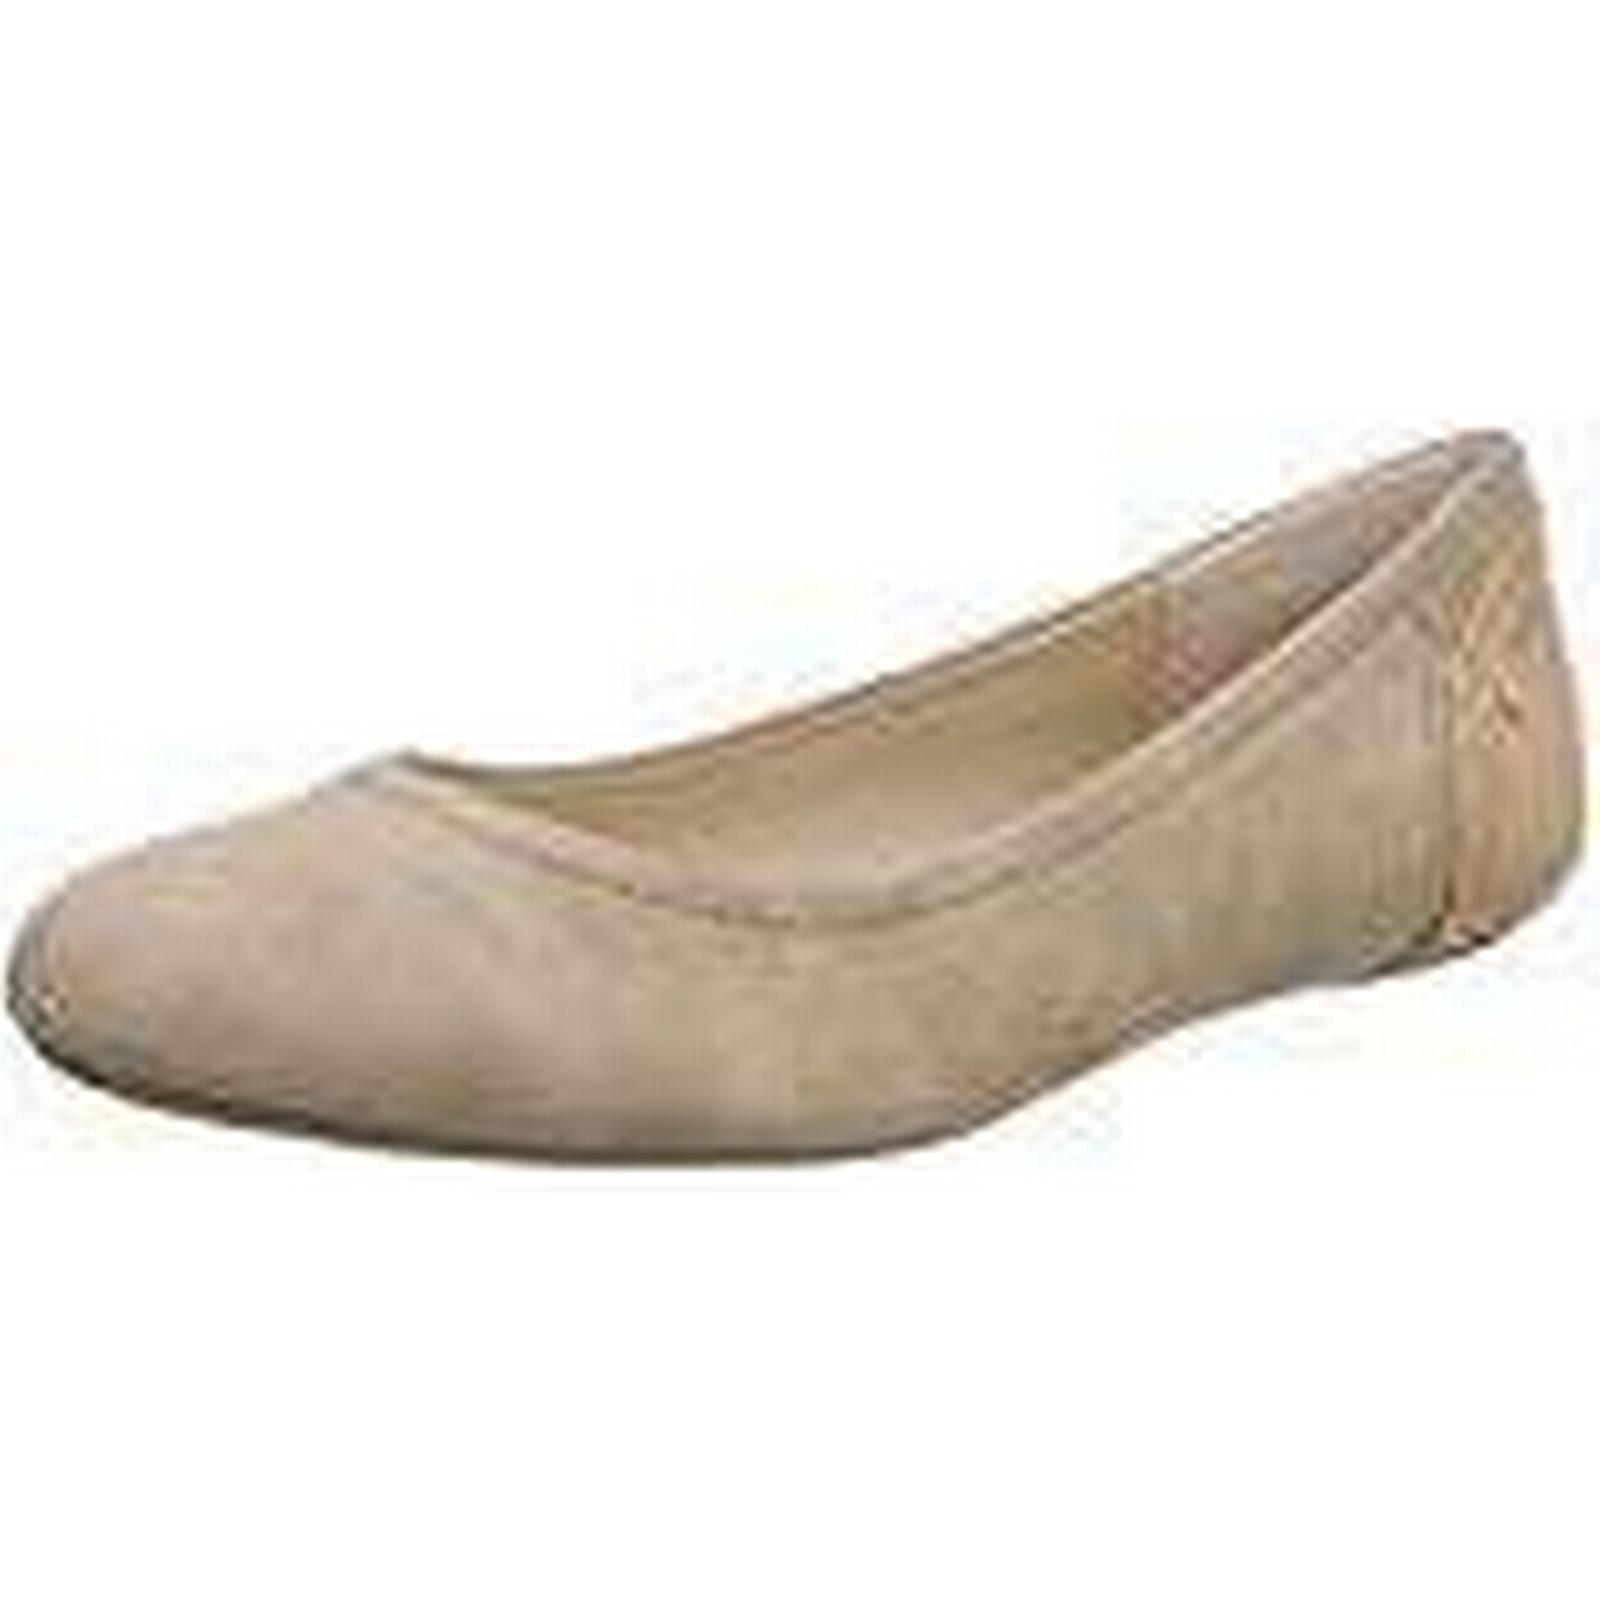 ESPRIT Women's Aloa Ballerina Closed Toe Pink Ballet Flats, (Dark Old Pink Toe 675), 3.5 UK 3.5 UK 84428b